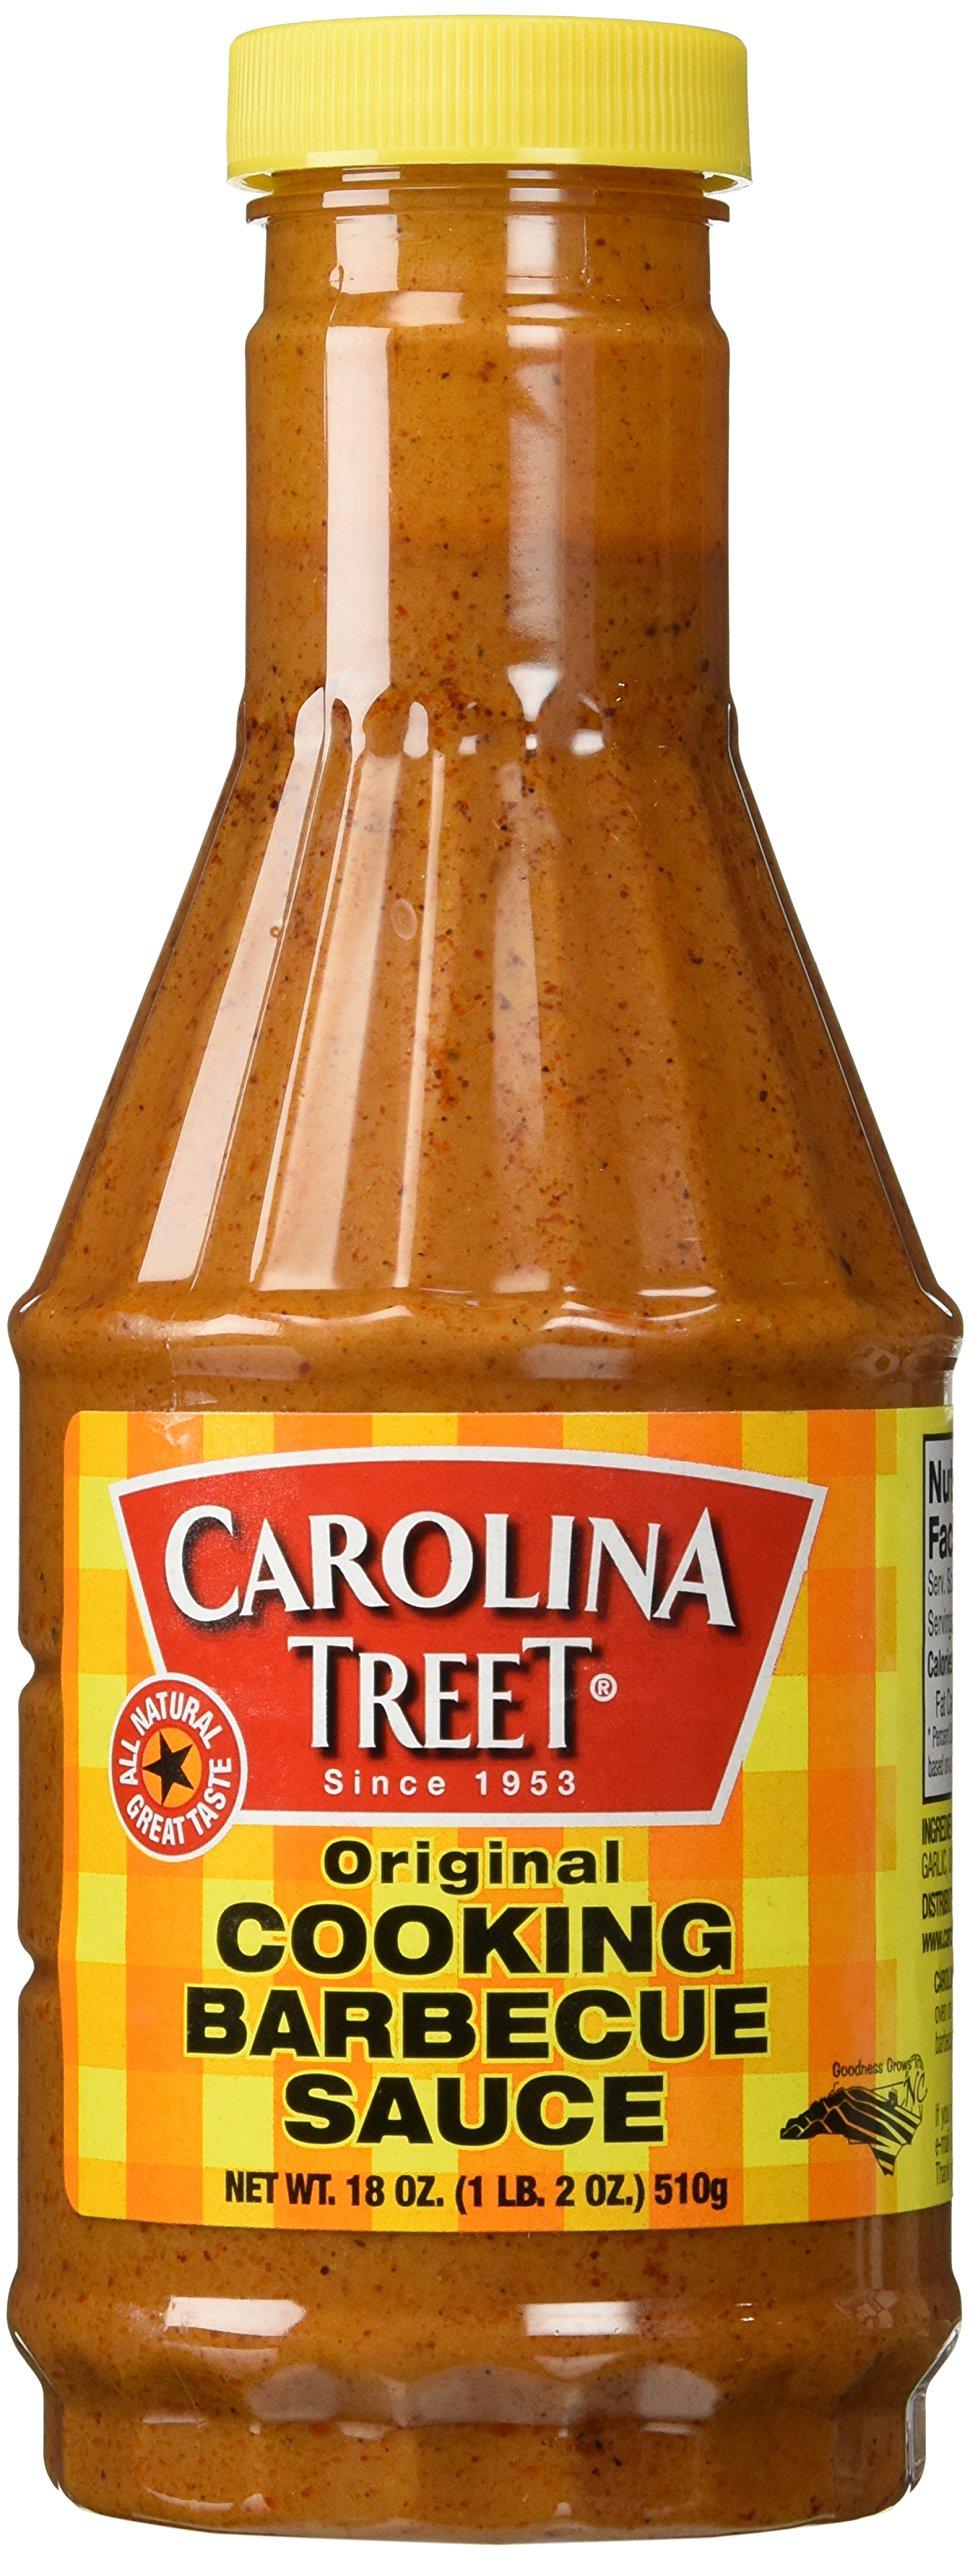 Carolina Treet Cooking Barbecue Sauce, Original Flavor, 18 Ounce.